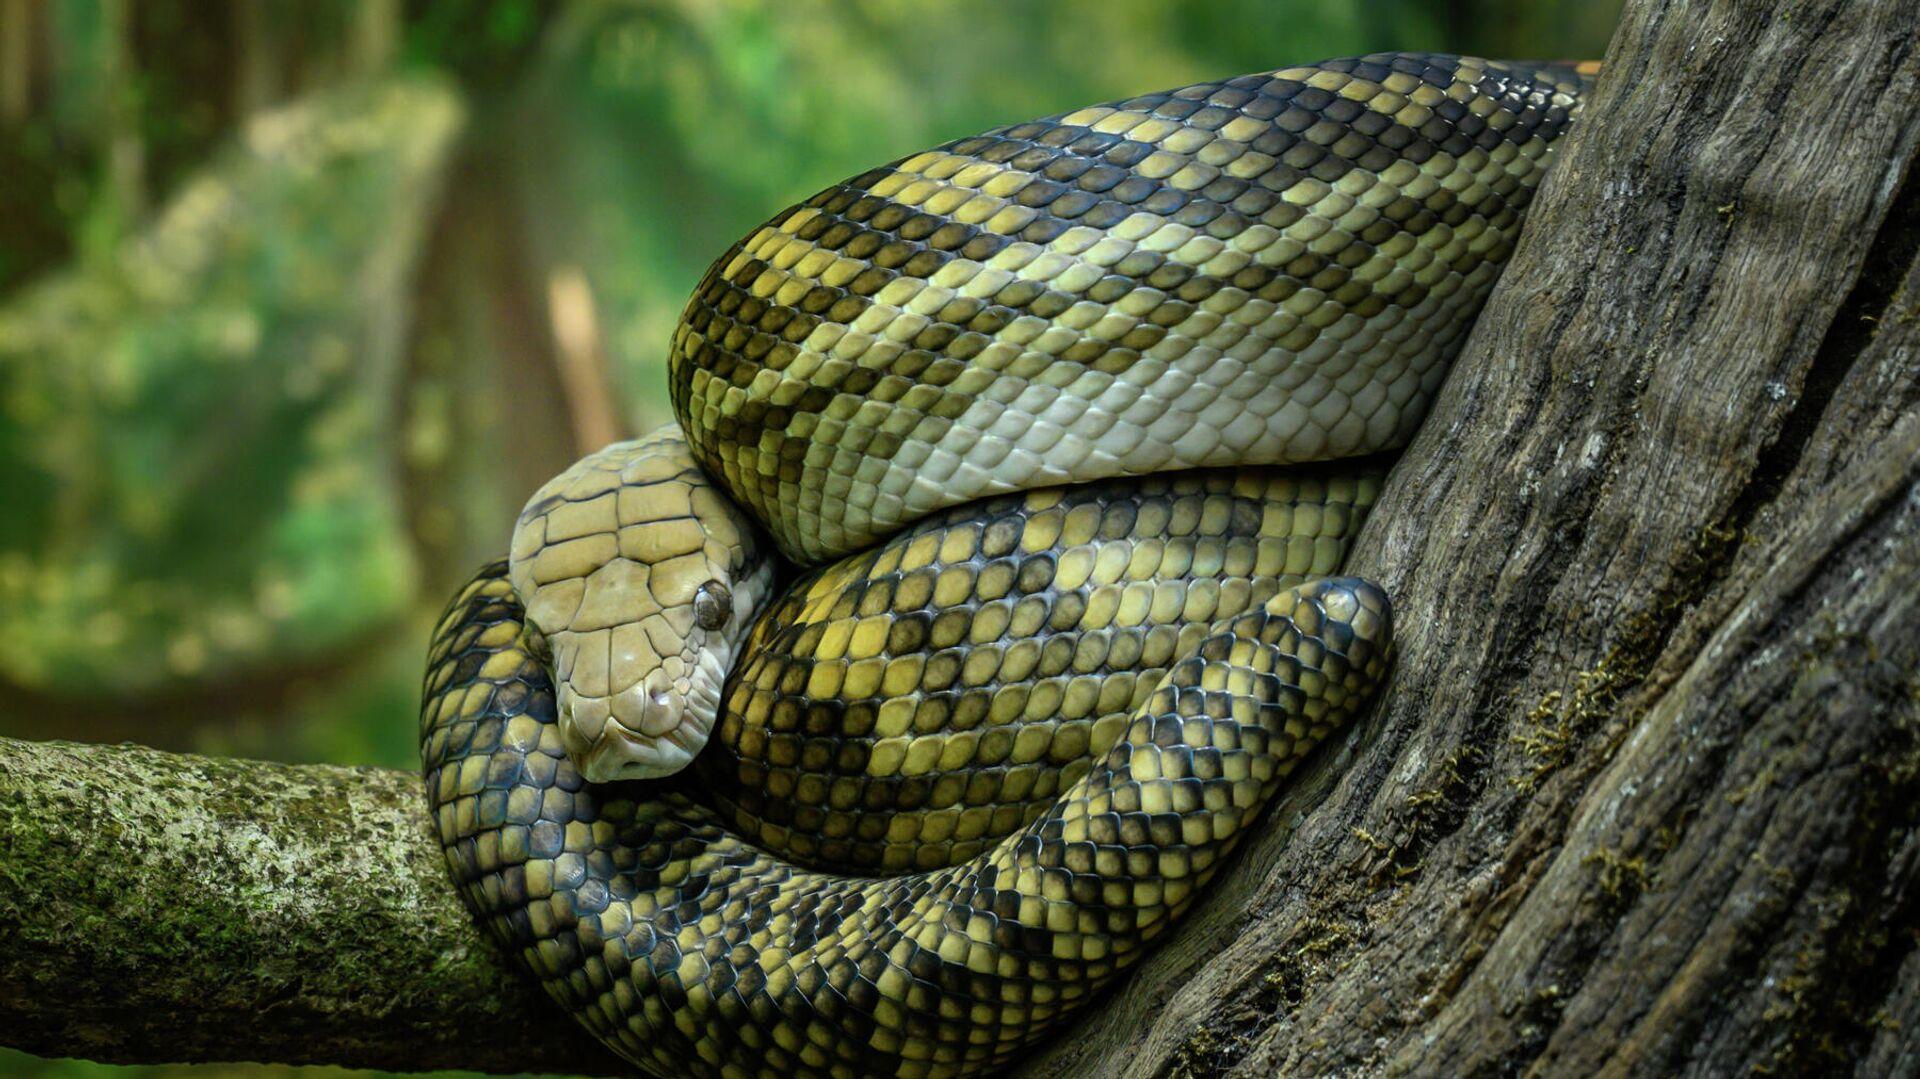 Python in Australia Zoo, Beerwah, Sunshine Coast - Sputnik International, 1920, 18.09.2021